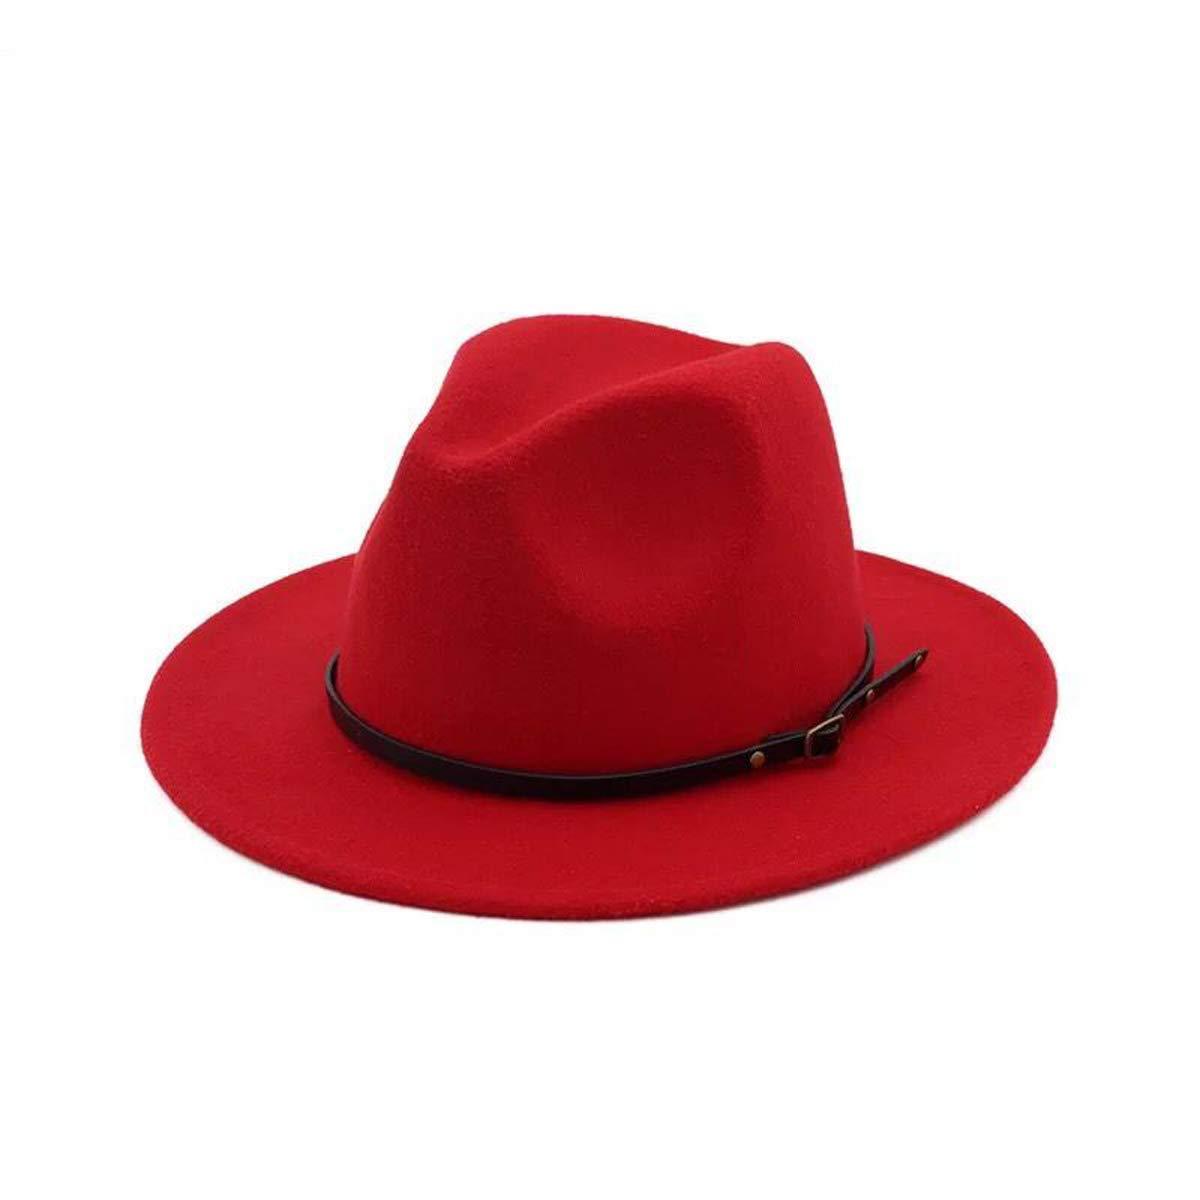 Lanzom Women Lady Retro Wide Brim Floppy Panama Hat Belt Buckle Wool Fedora Hat One Size)